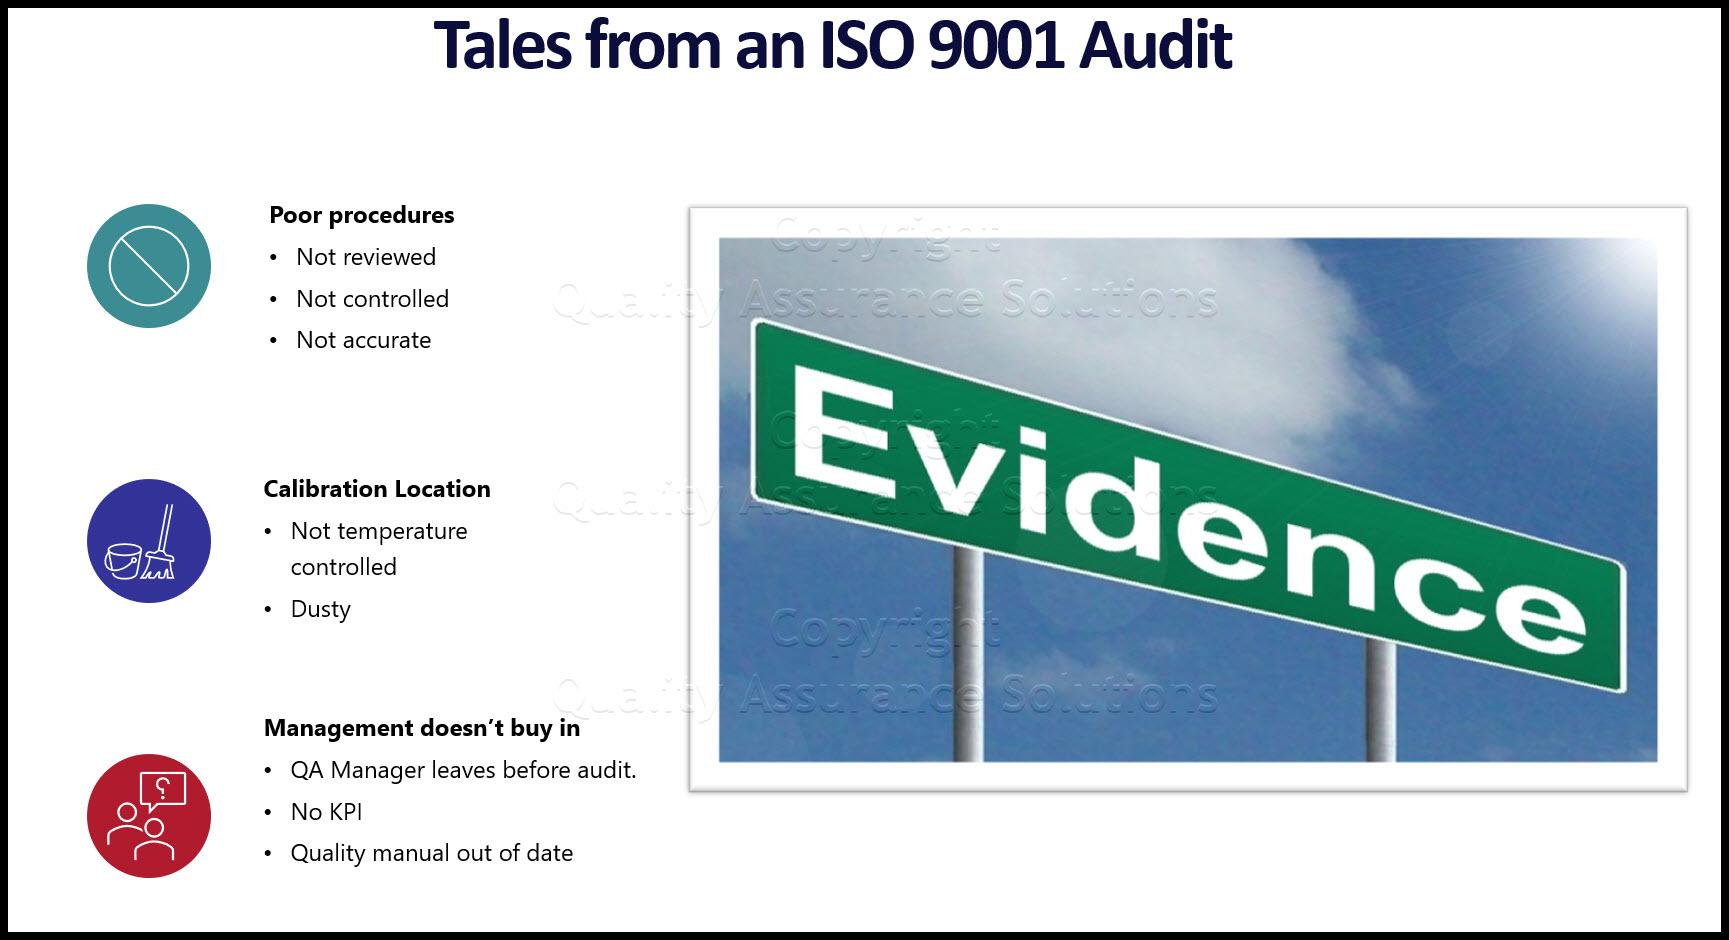 ISO 9001 Definition Survival Guide business slide